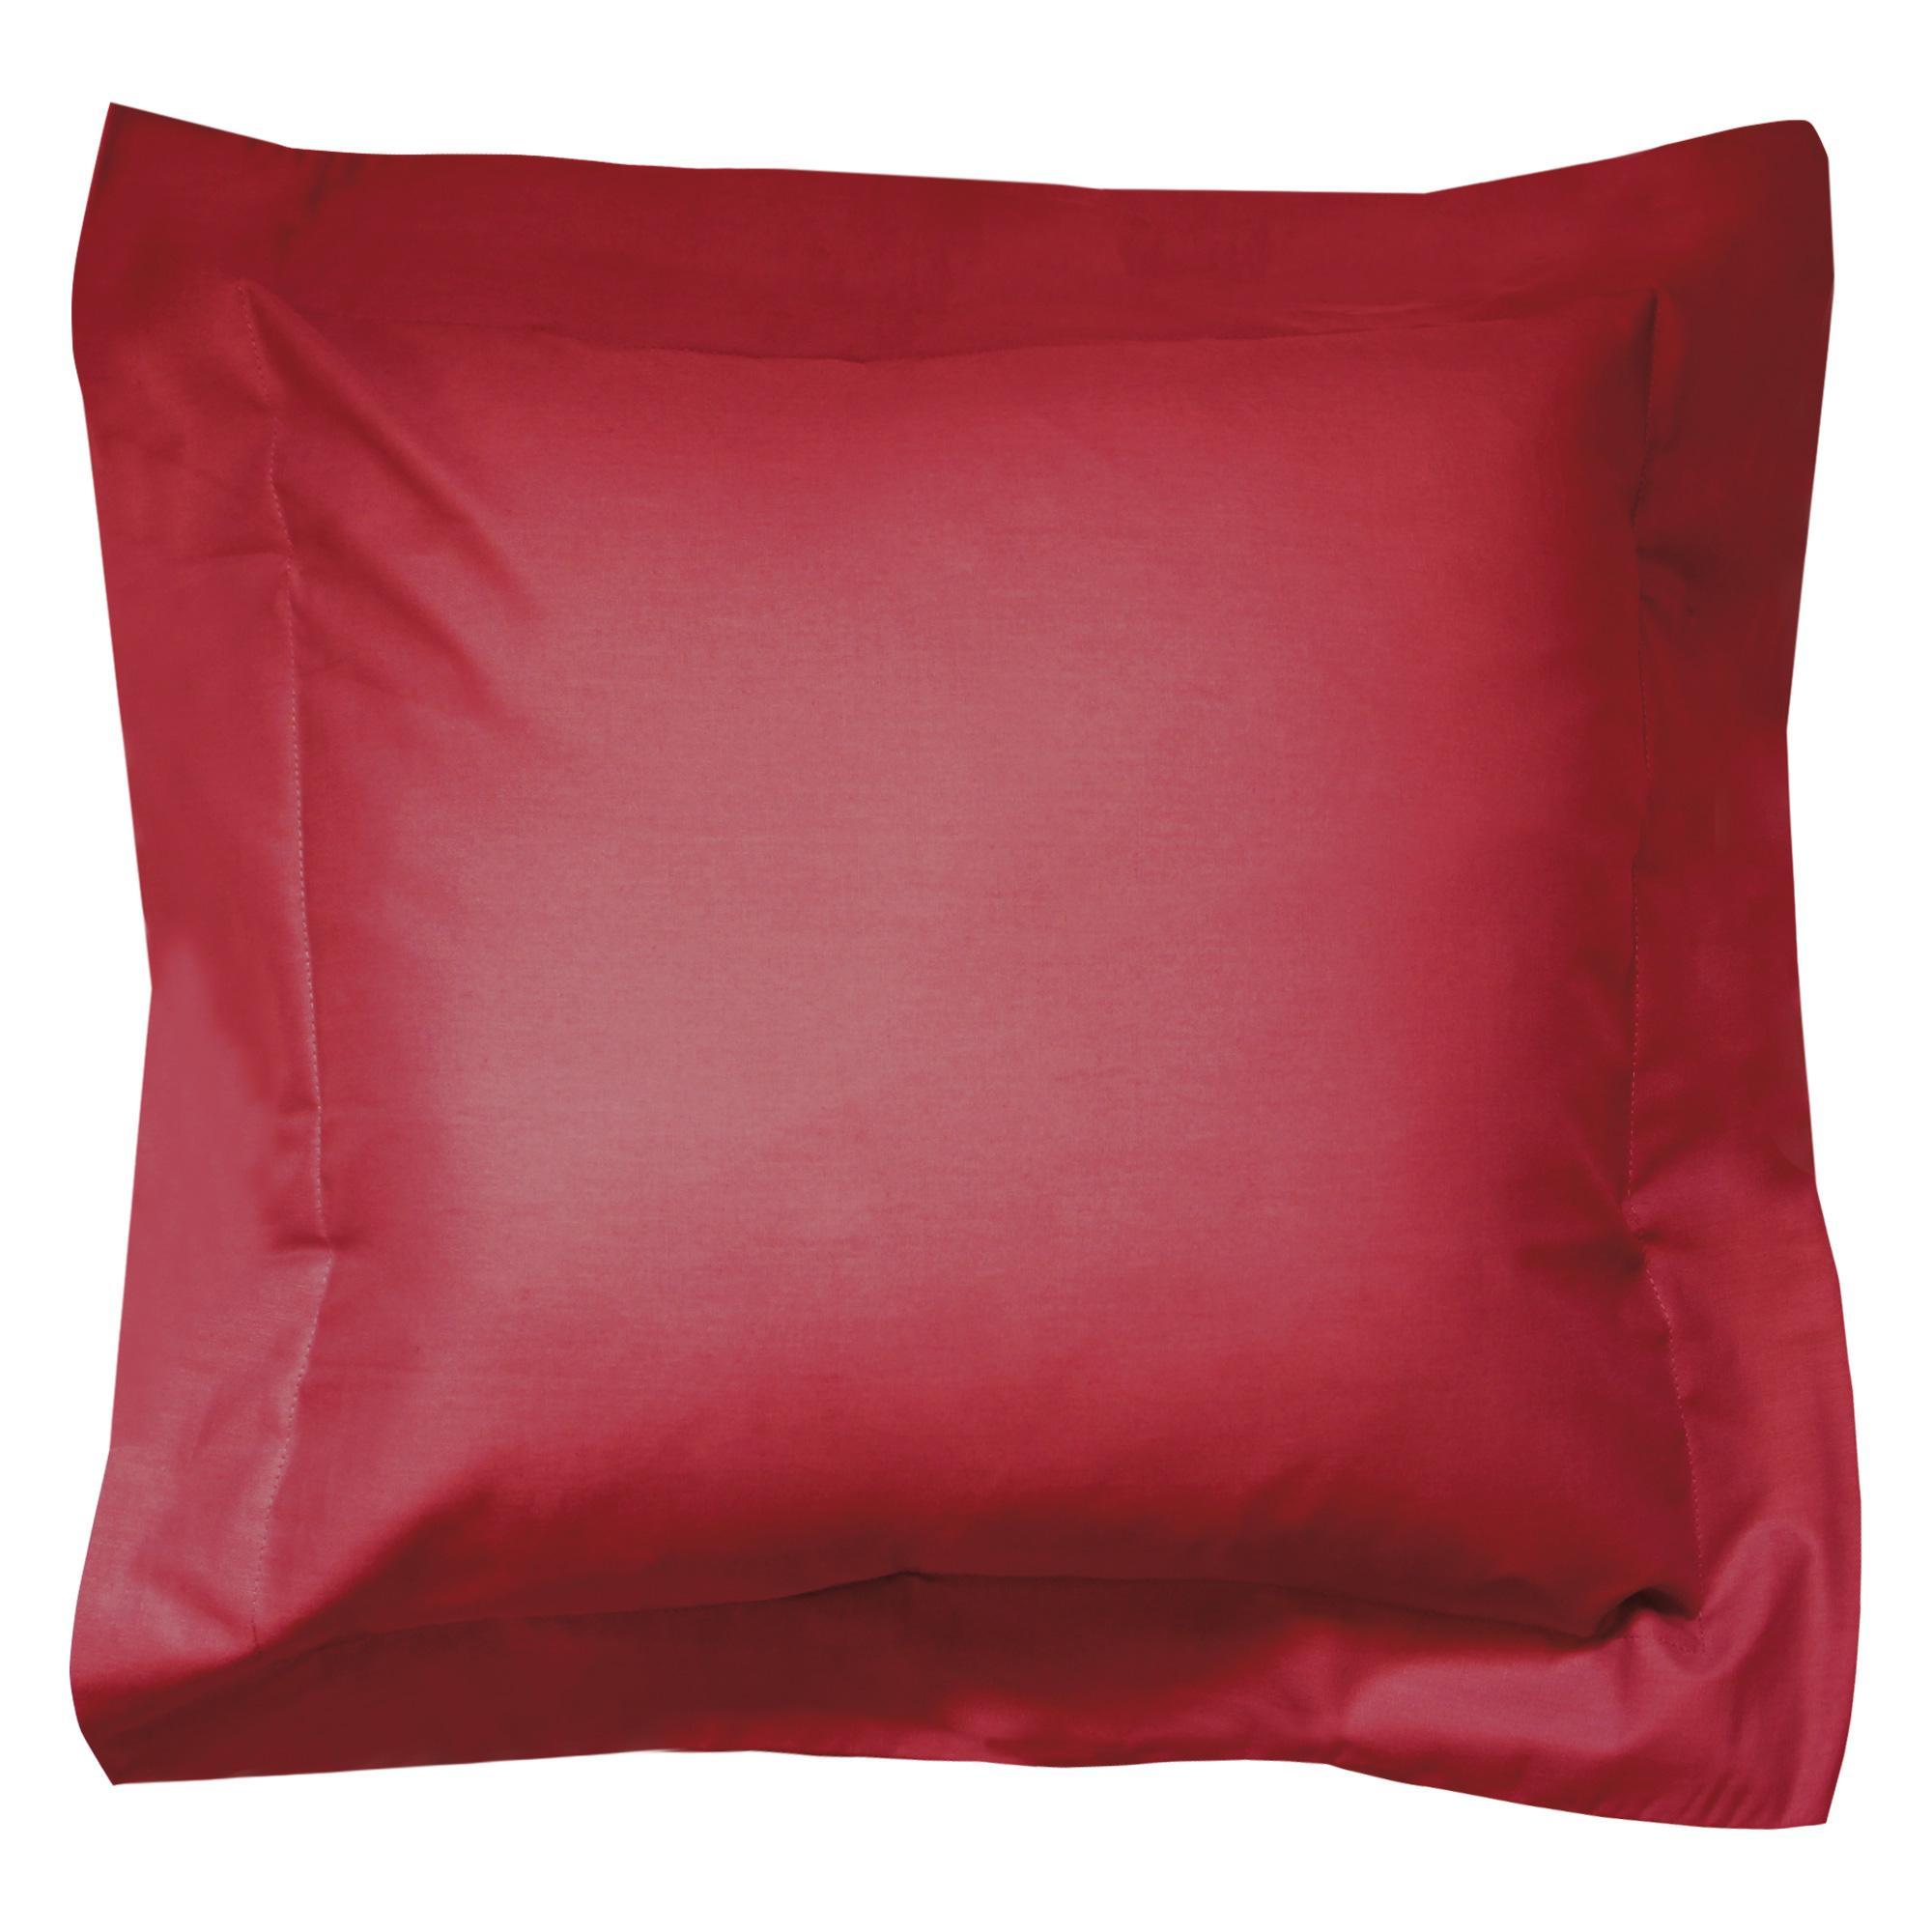 taie d oreiller 40x40 Taie d'oreiller 40x40cm uni pur coton ALTO rouge Garance | Linnea  taie d oreiller 40x40